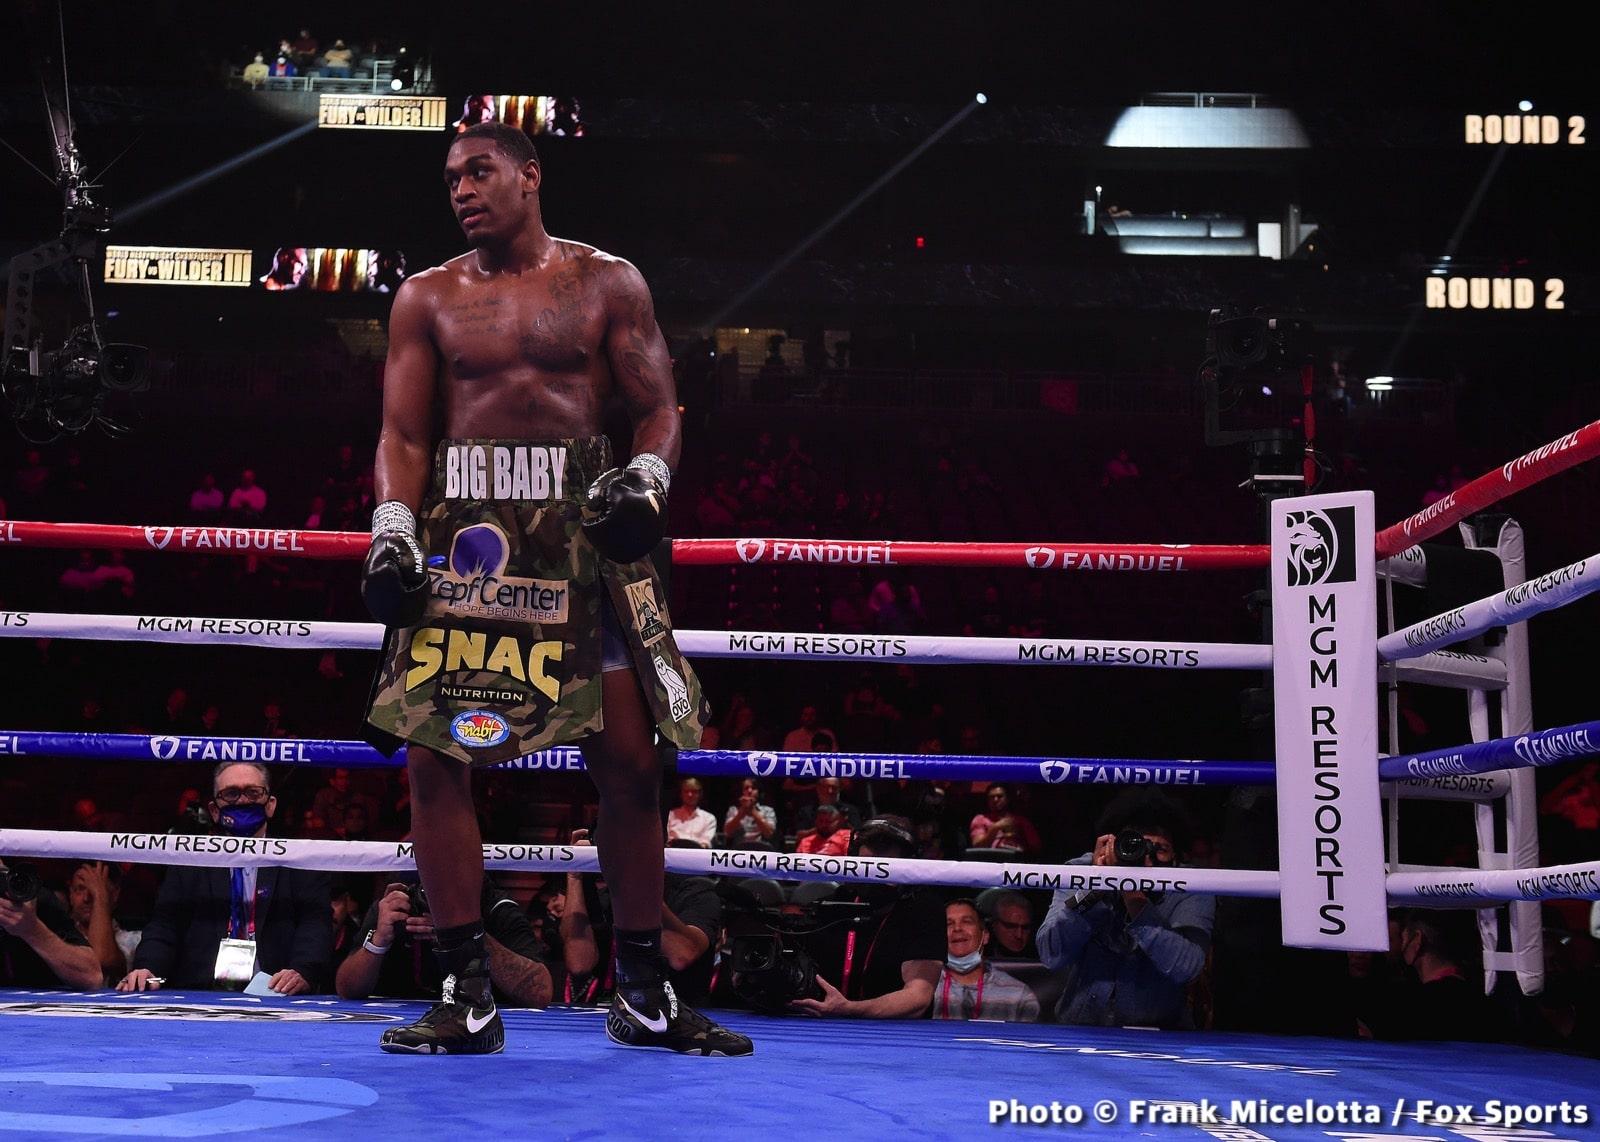 Jared Anderson, Vladimir Tereshkin - Boxing Results